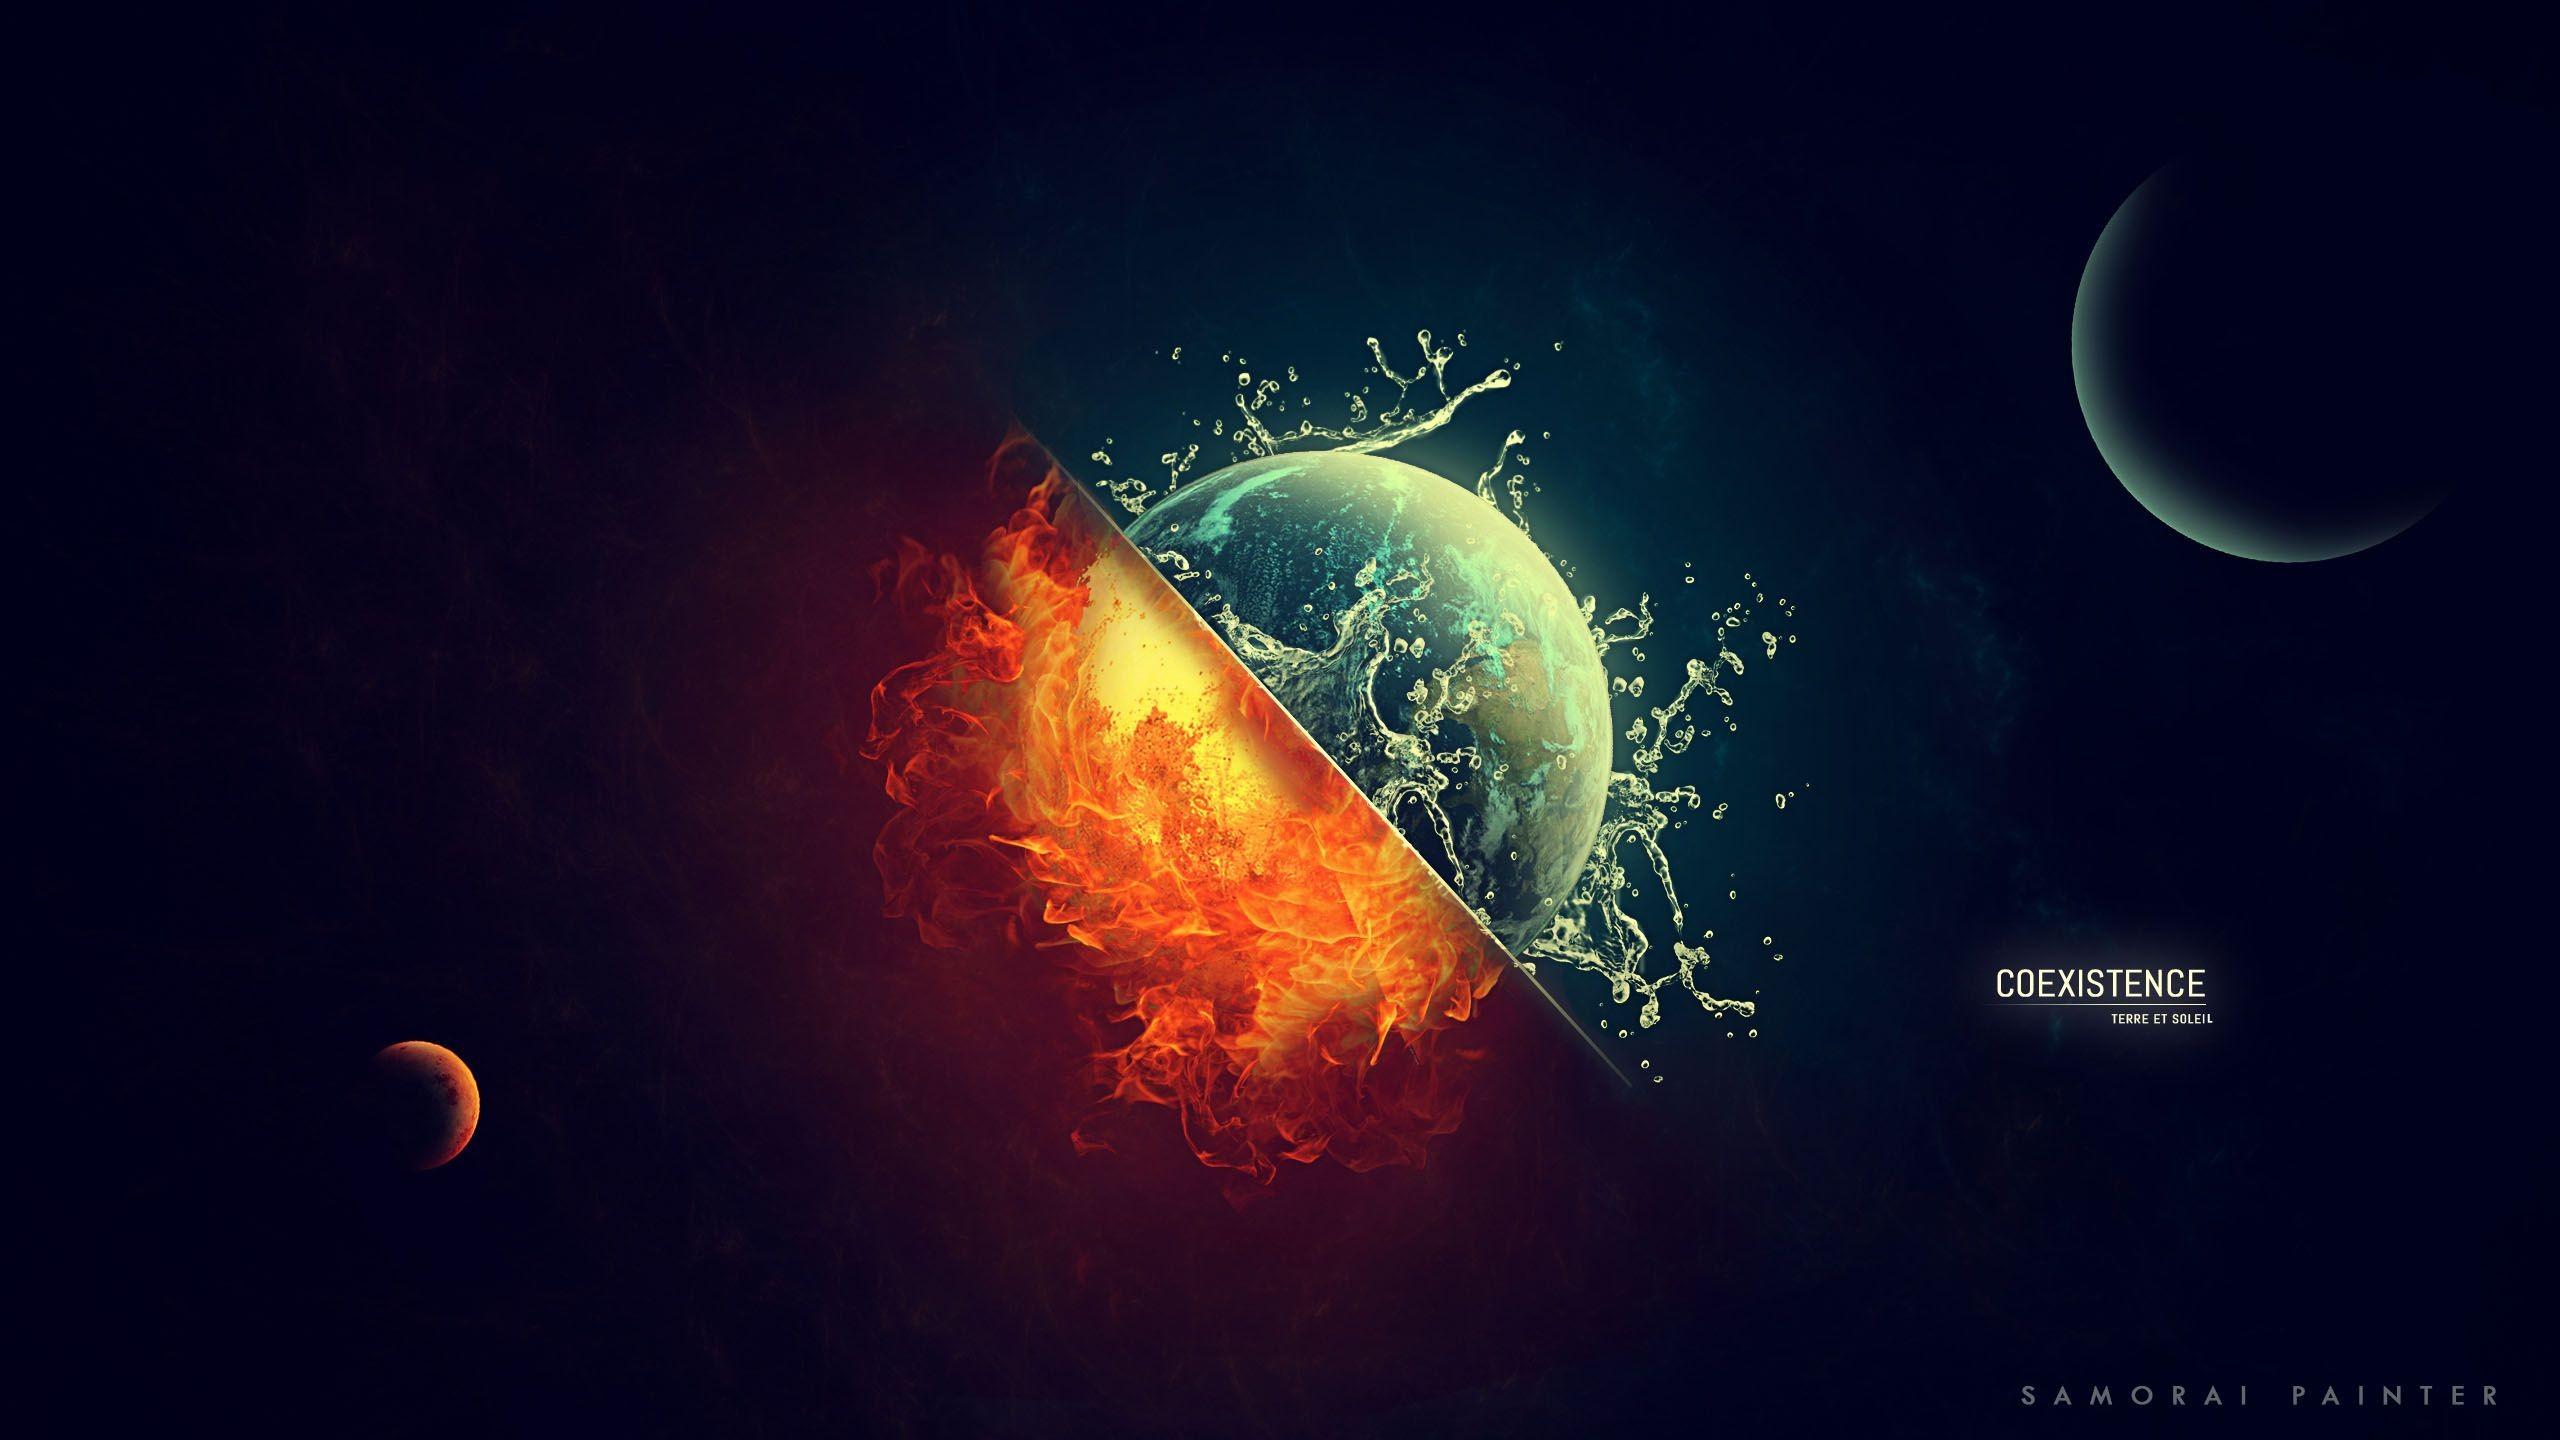 Earth Digital Art Hd Wallpaper: Wallpaper : 2560x1440 Px, Burning, Coexist, Digital Art